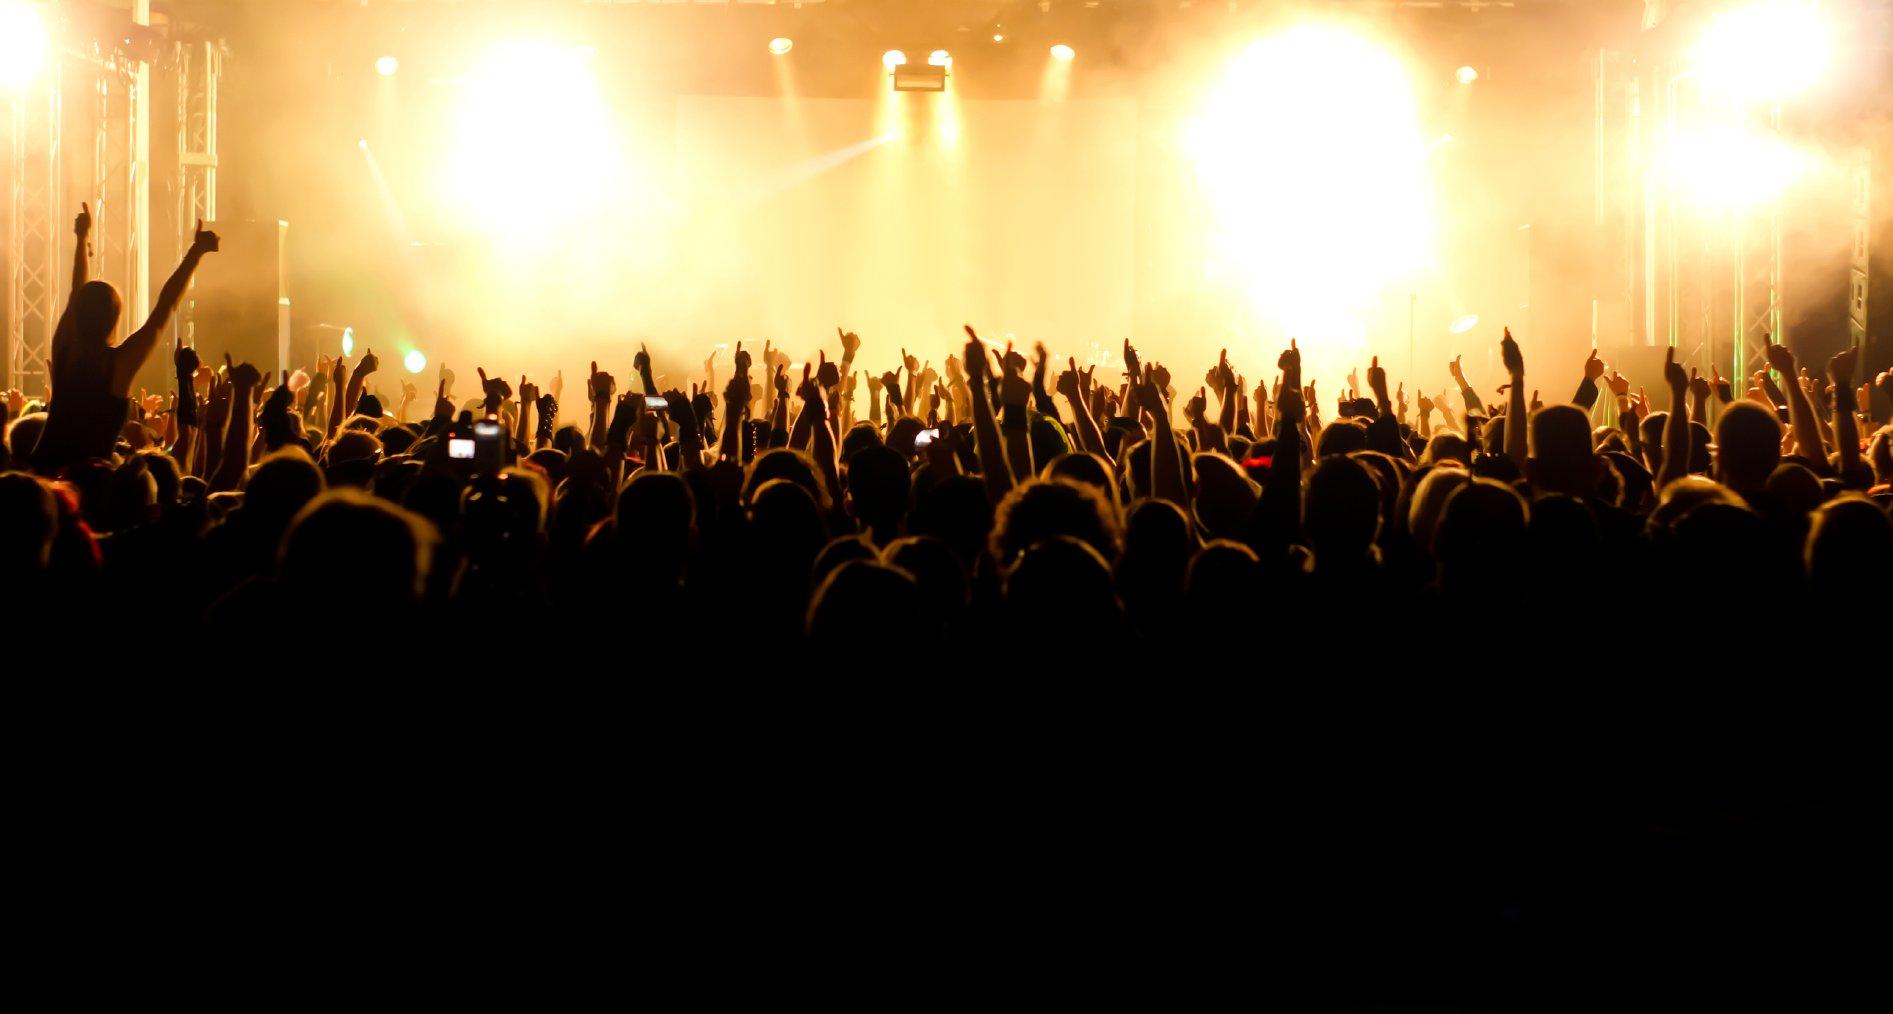 Concert stage wallpaper